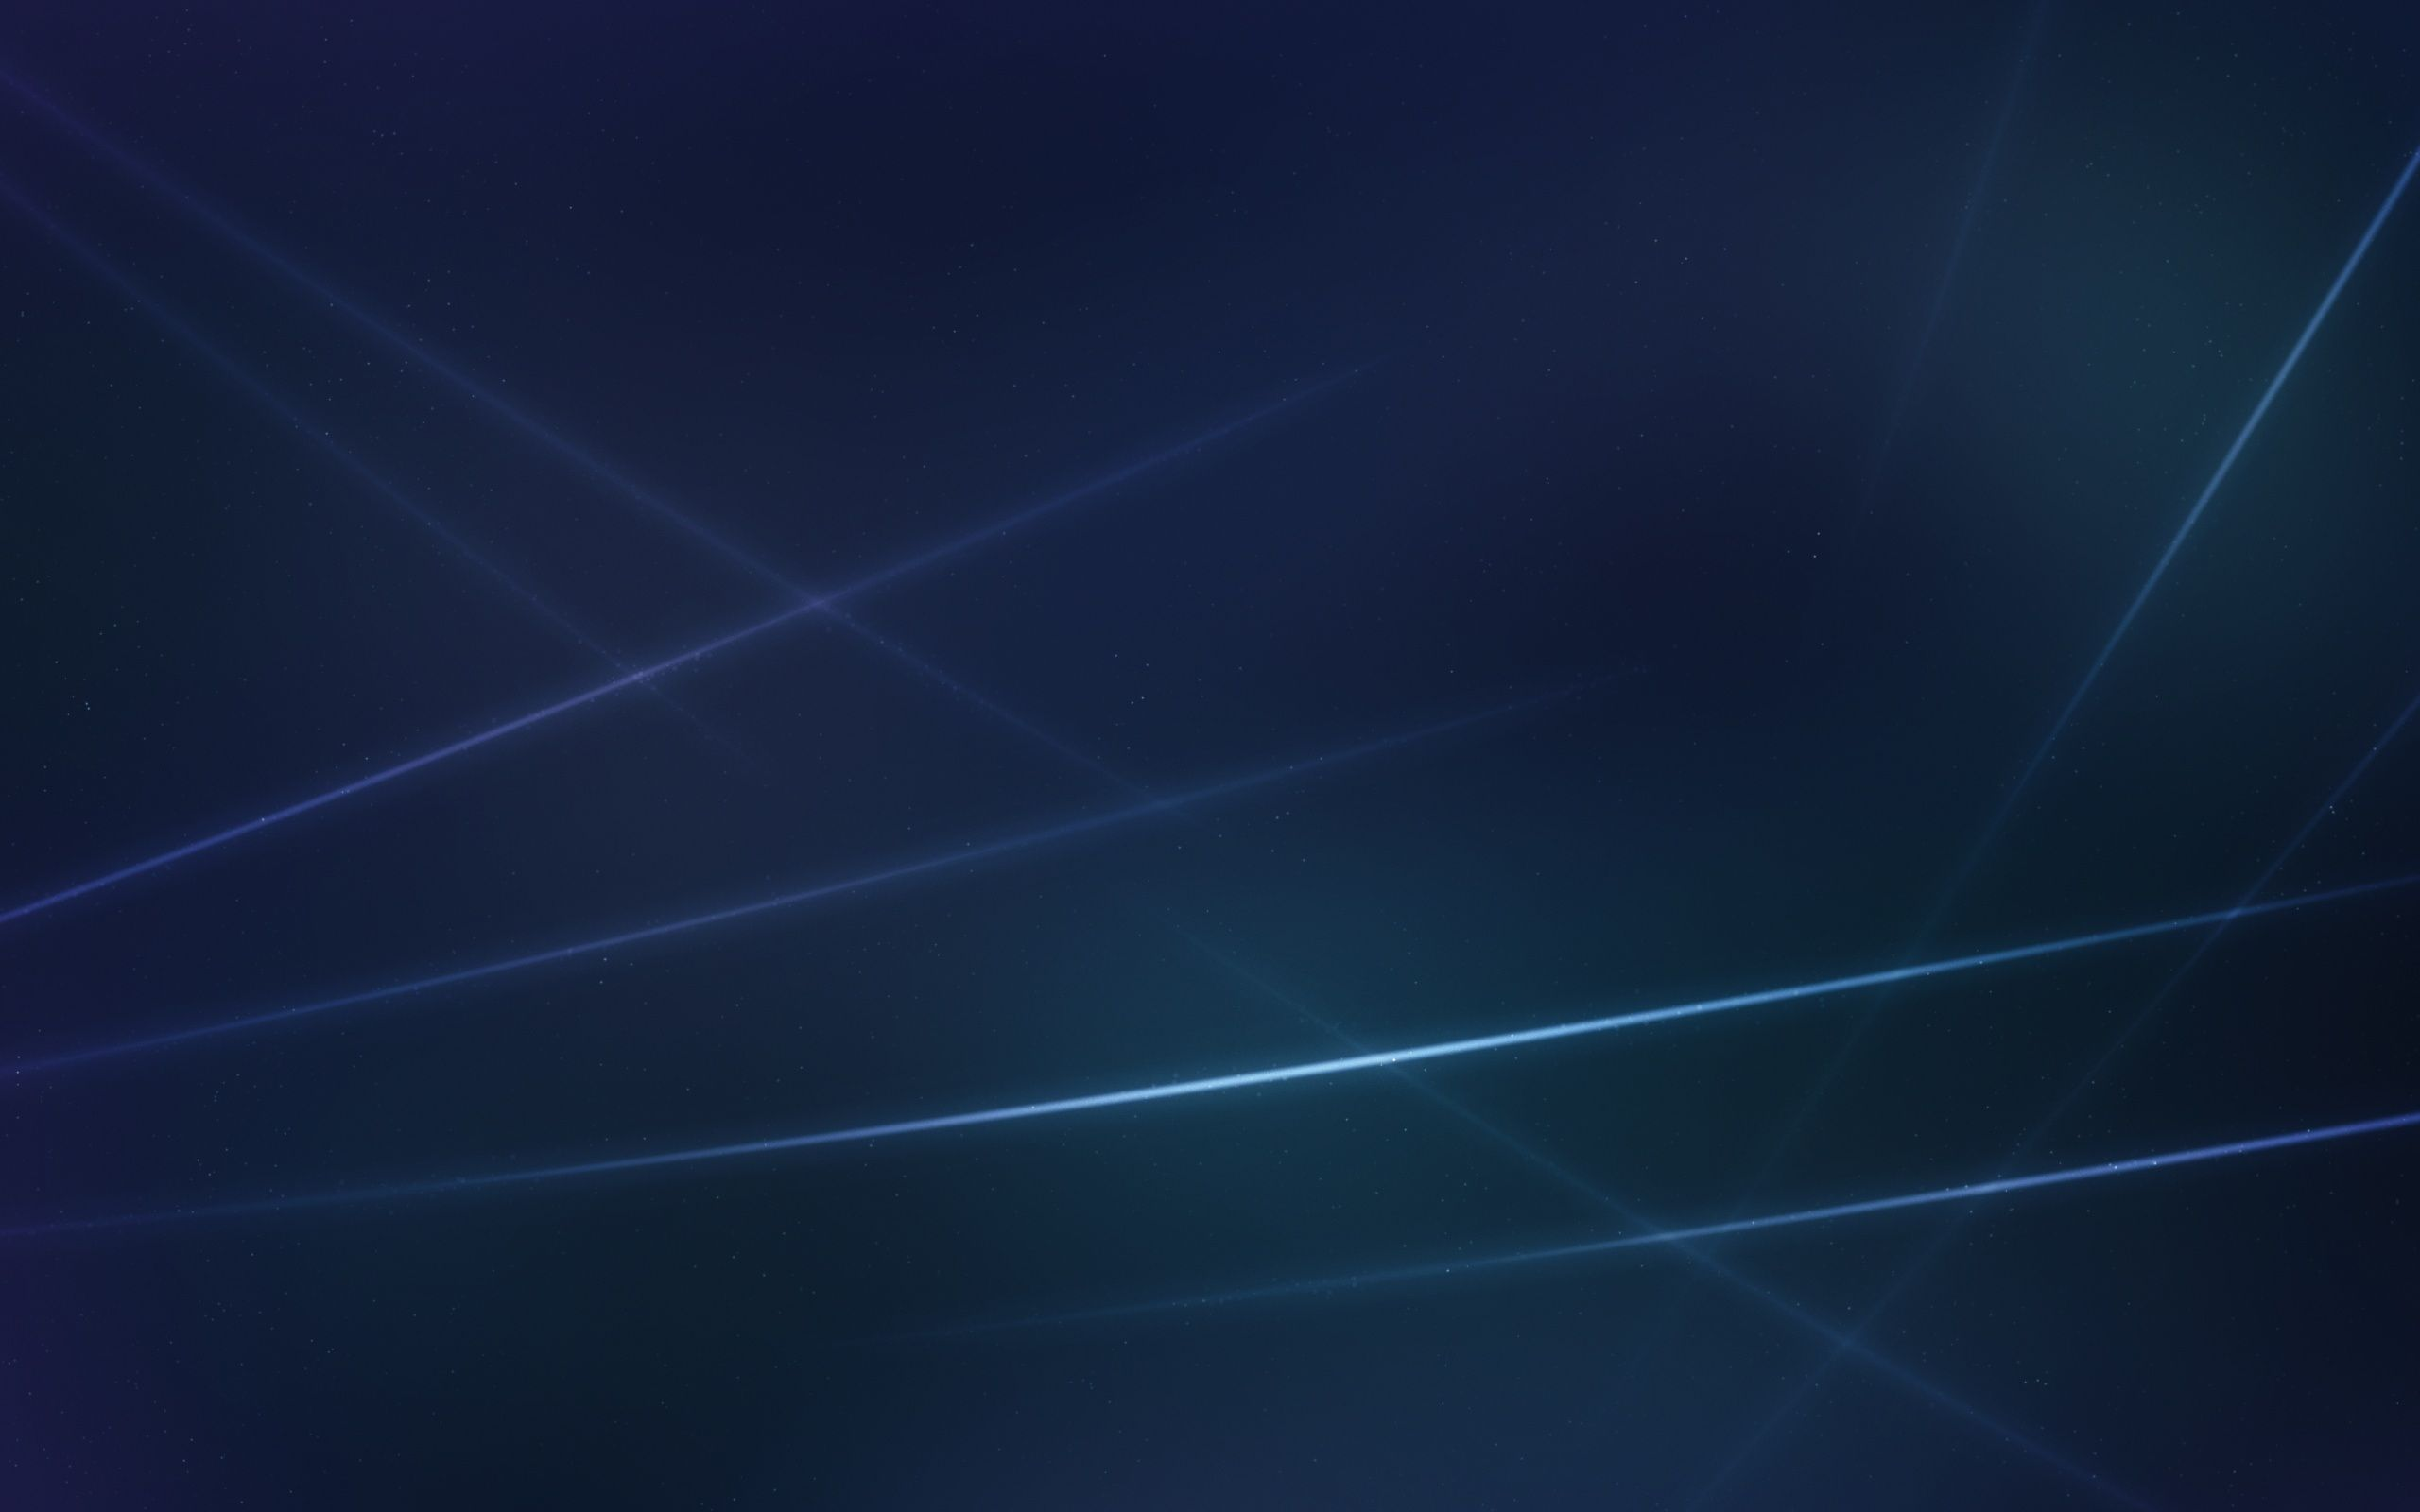 Dark Blue Laptop Wallpapers Top Free Dark Blue Laptop Backgrounds Wallpaperaccess